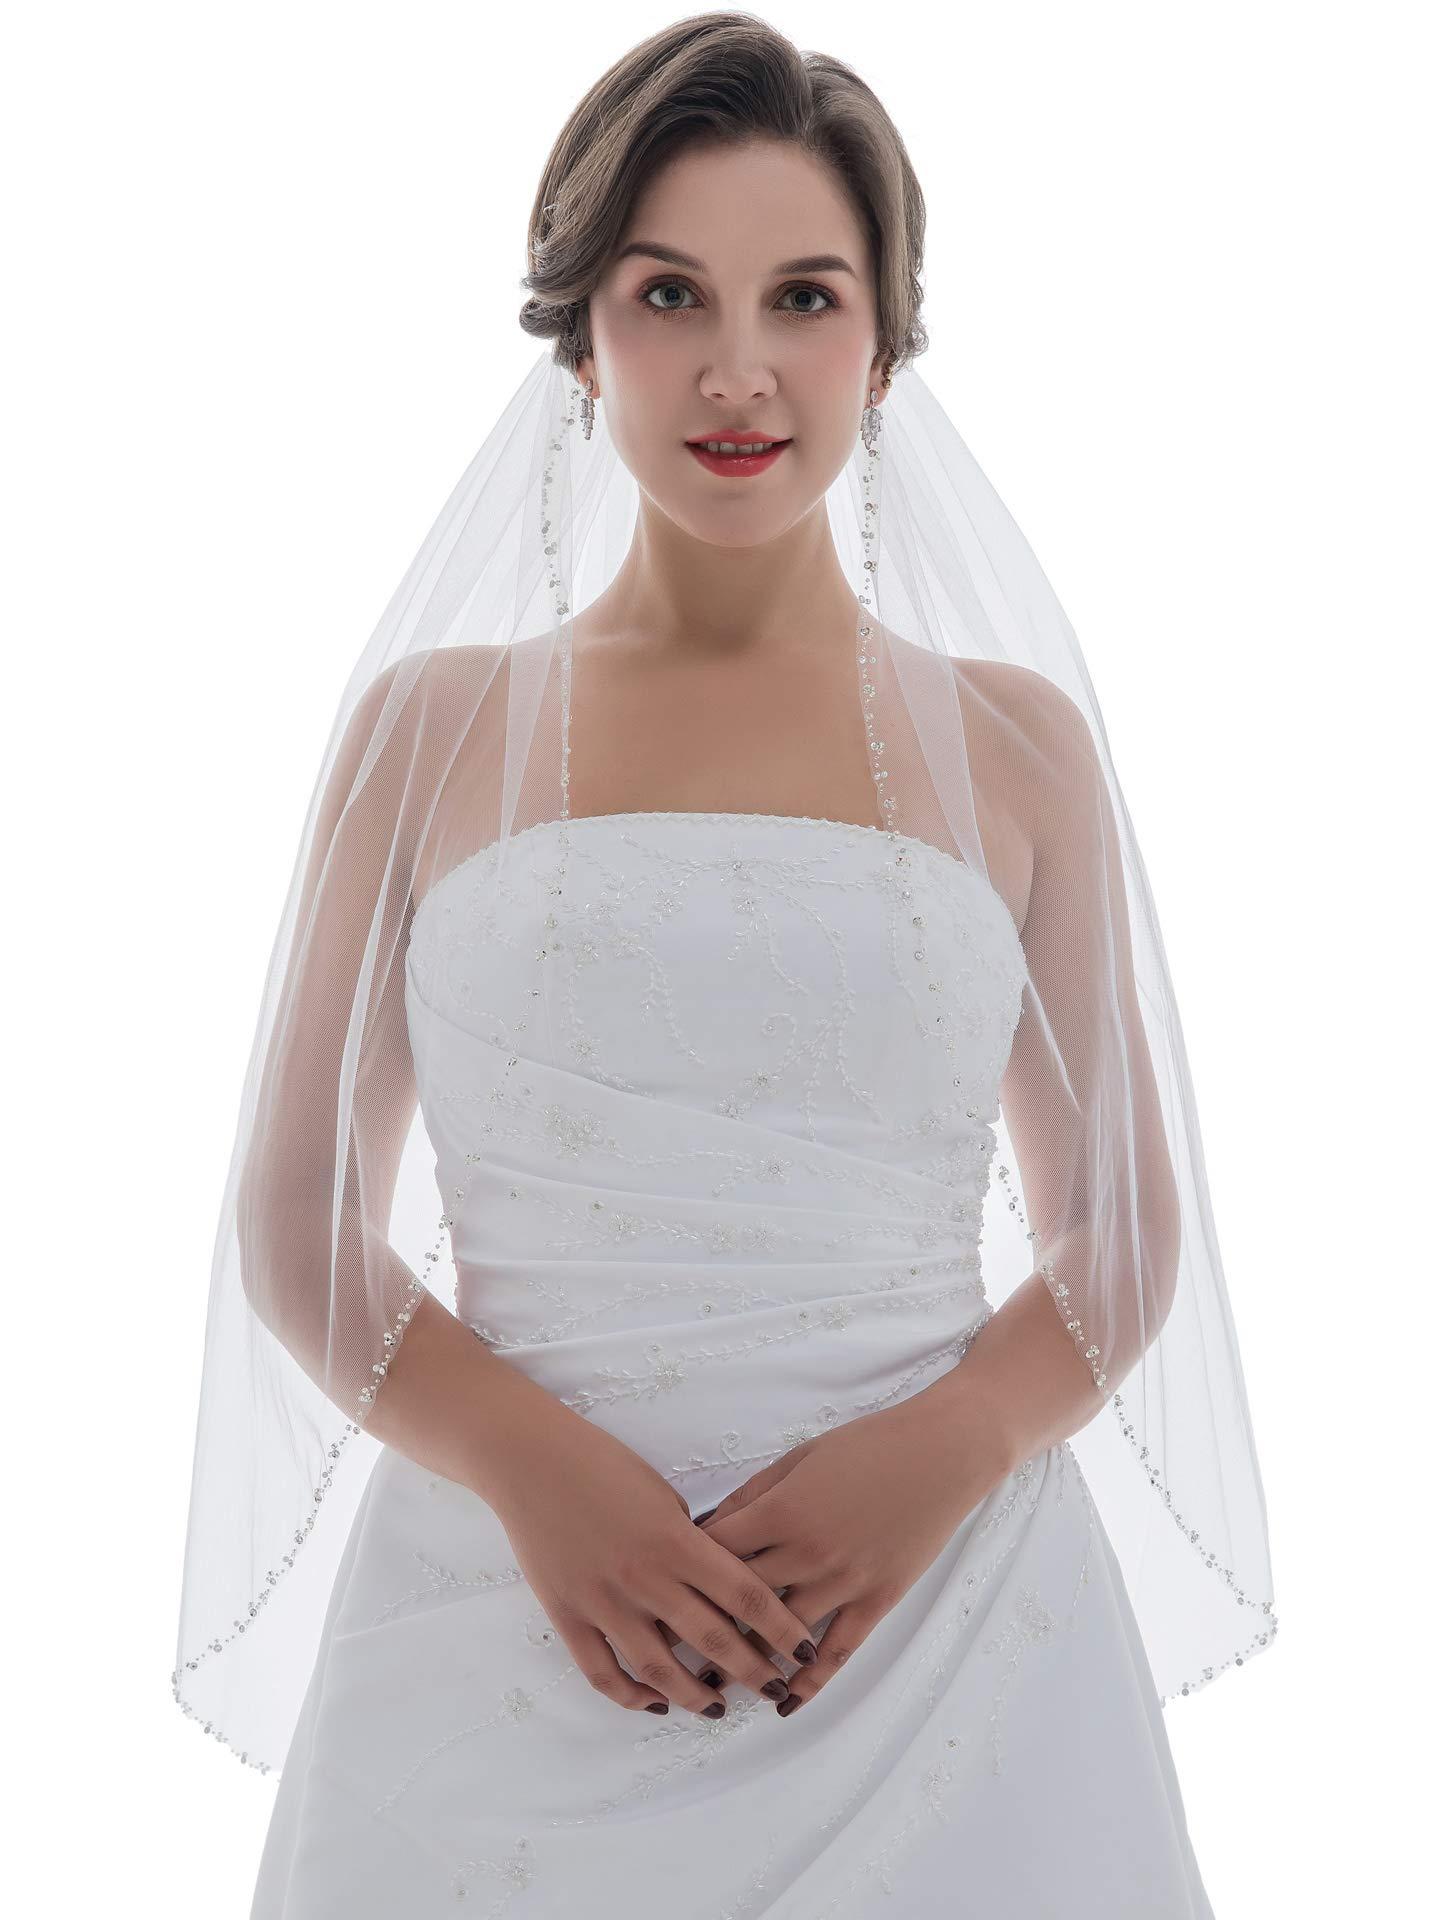 1T Rhinestone Pearl Sequin Beaded Wedding Veil (Fingertip Length 36'', Ivory) by SAMKY